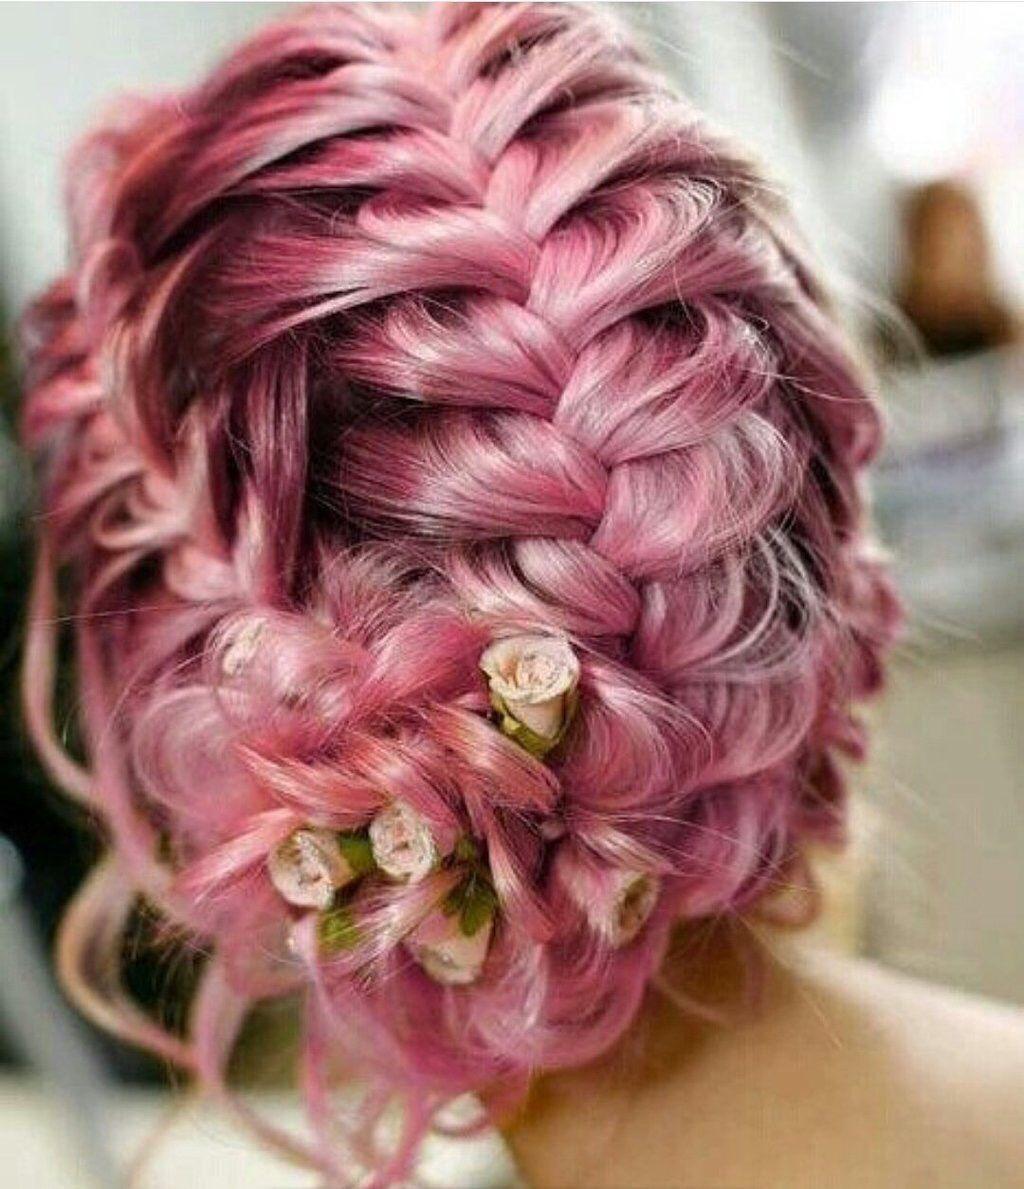 Pin by Teresa Savage on Hairstyles | Pinterest